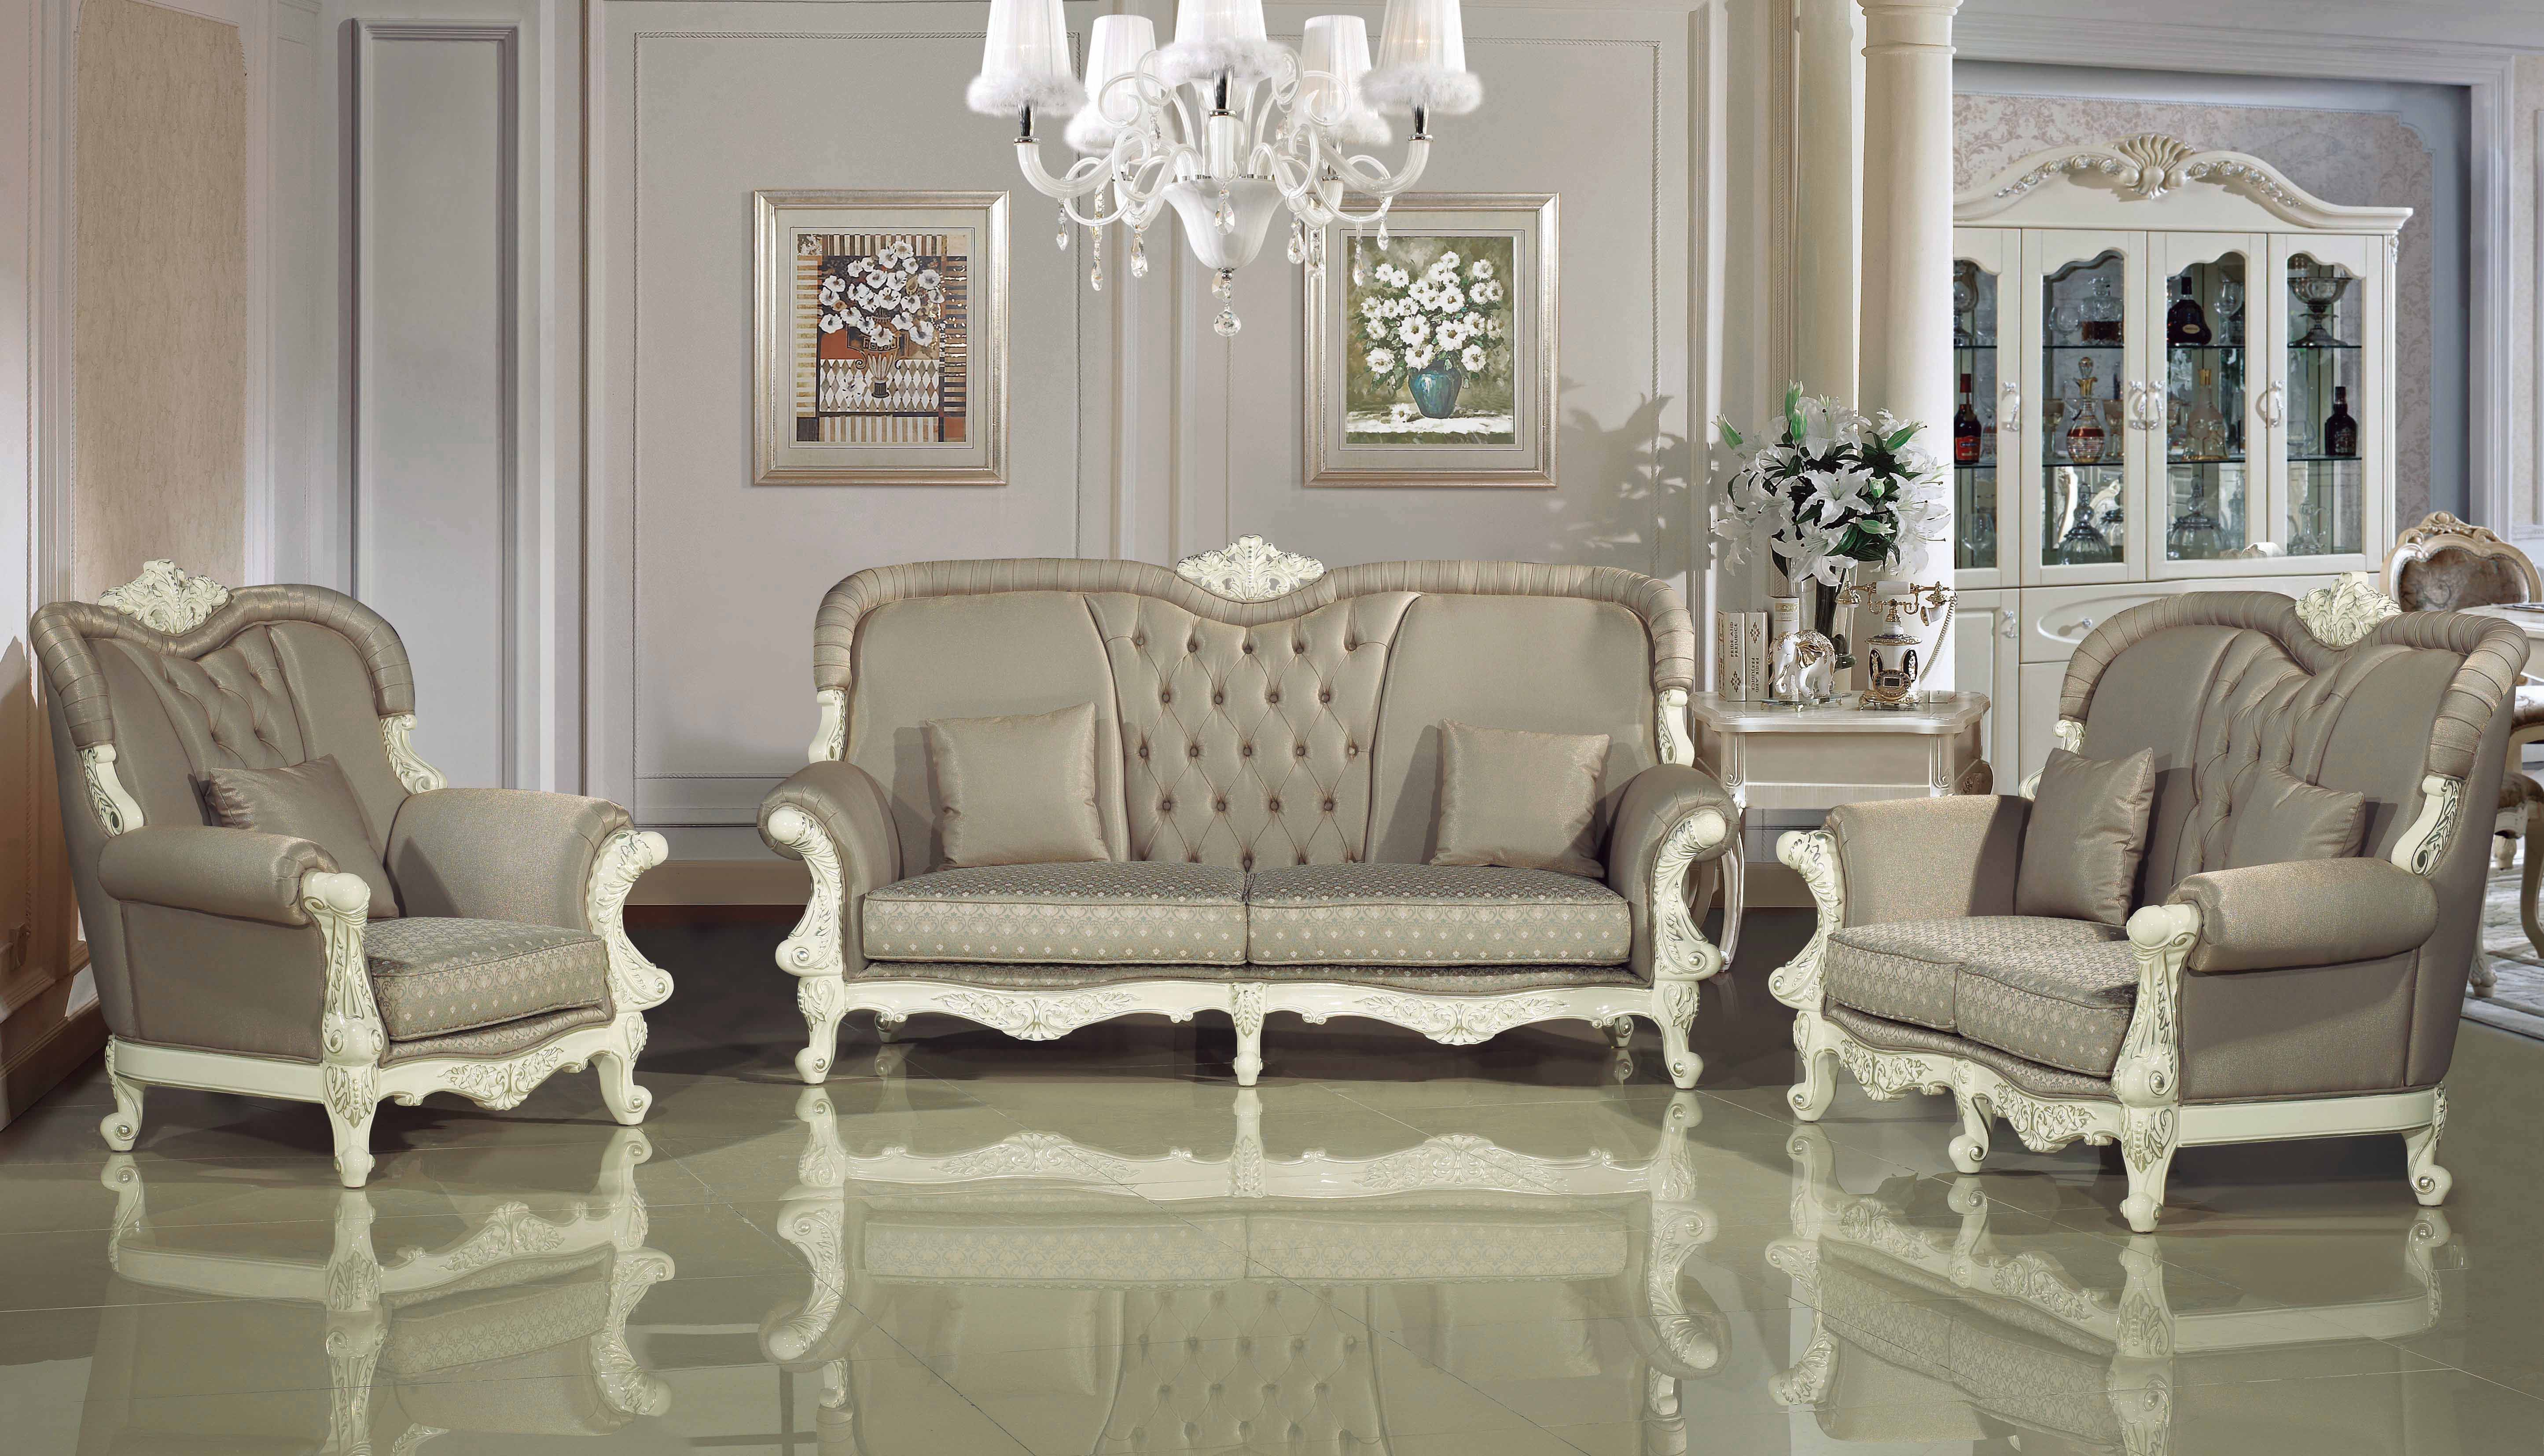 Explore White Sofa Design Living Room Wallpaper